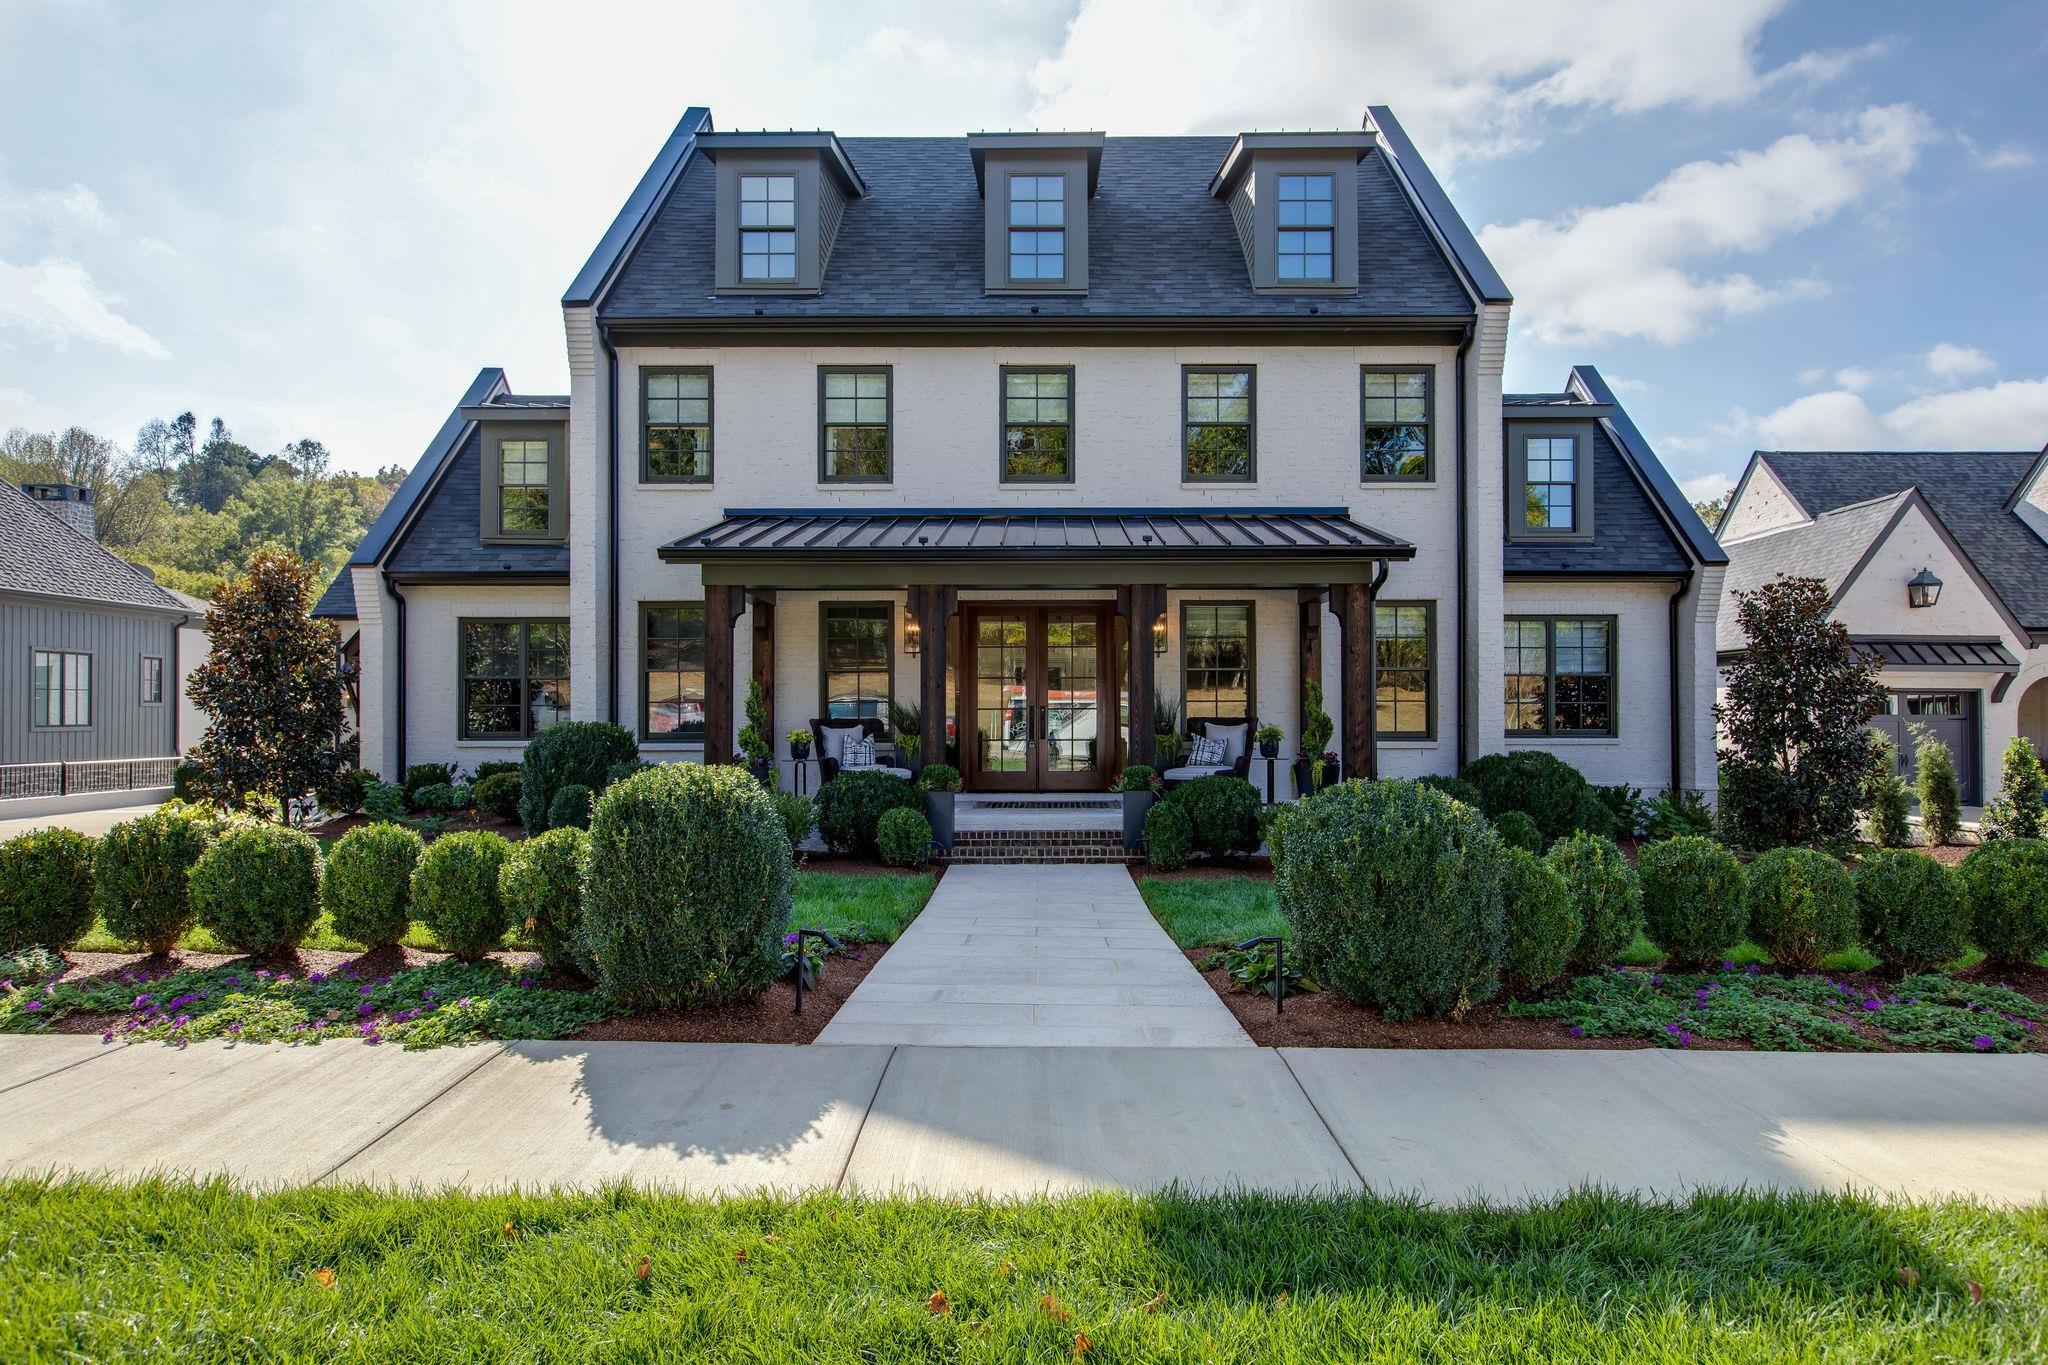 8142 Heirloom Blvd (Lot 11033), College Grove, TN 37046 - College Grove, TN real estate listing